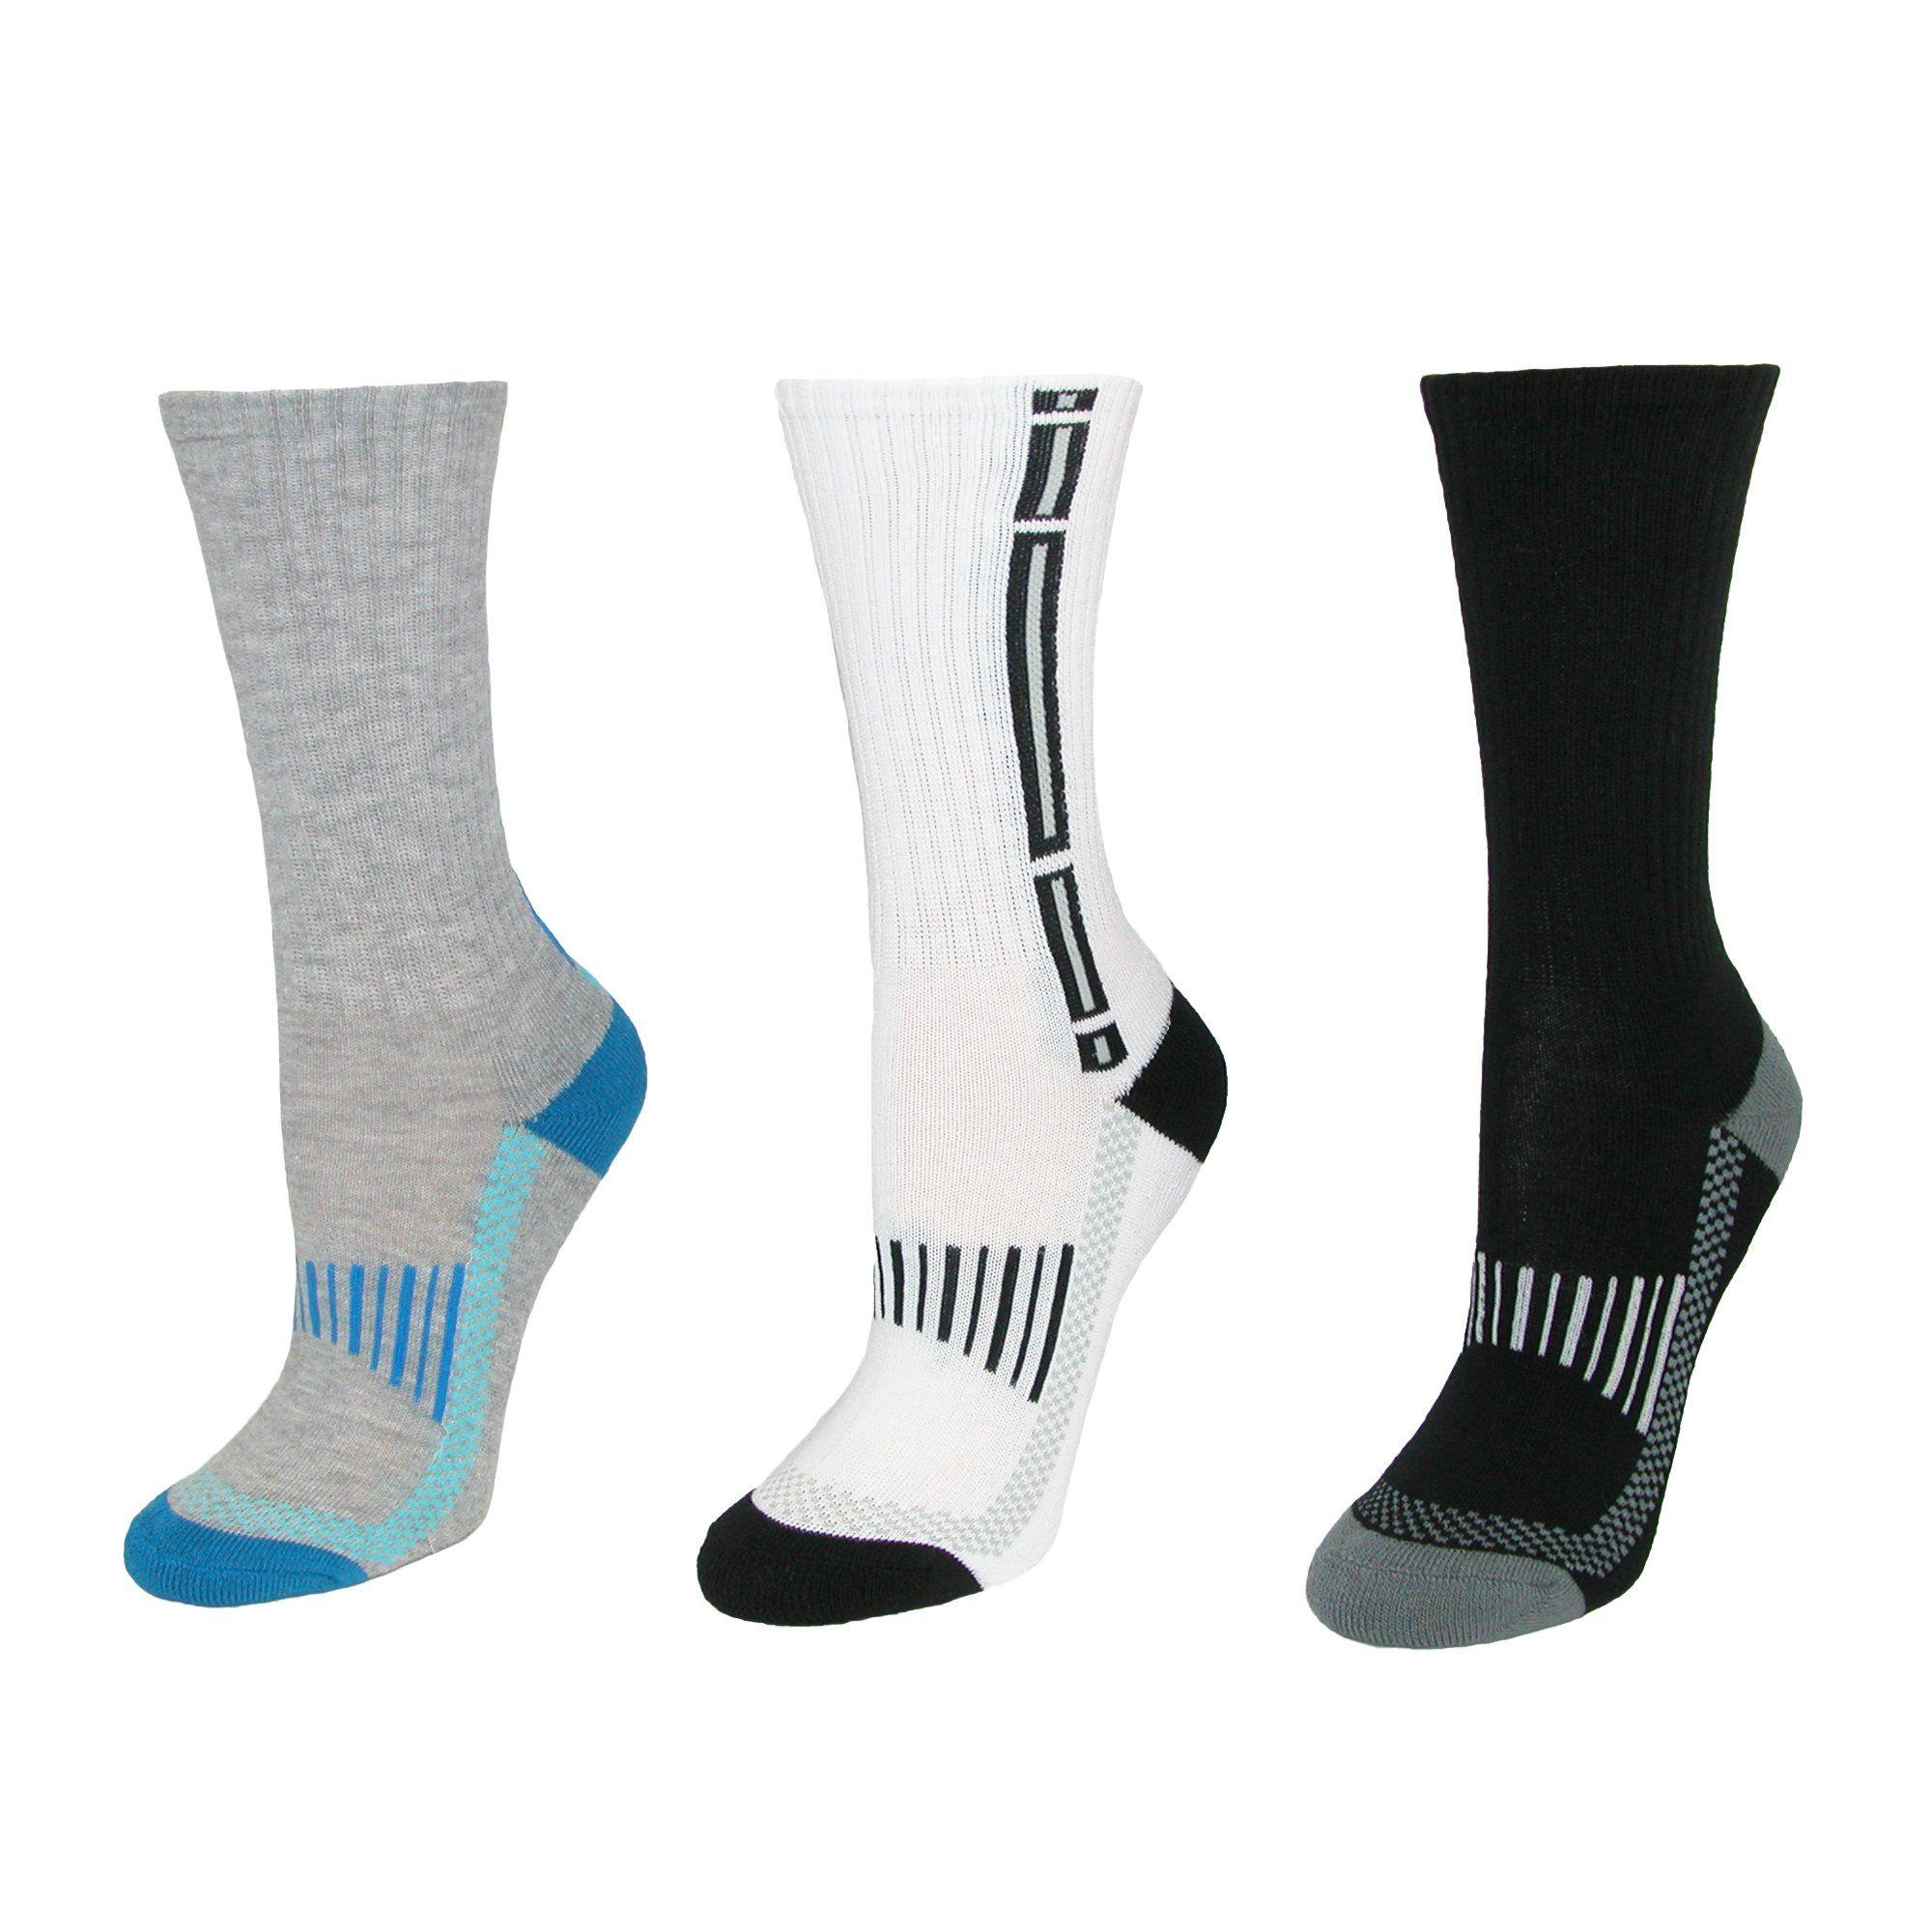 Jefferies Socks Boys/' Big Tech Sport Quarter Socks 6 Pair Pack Multicolor Large